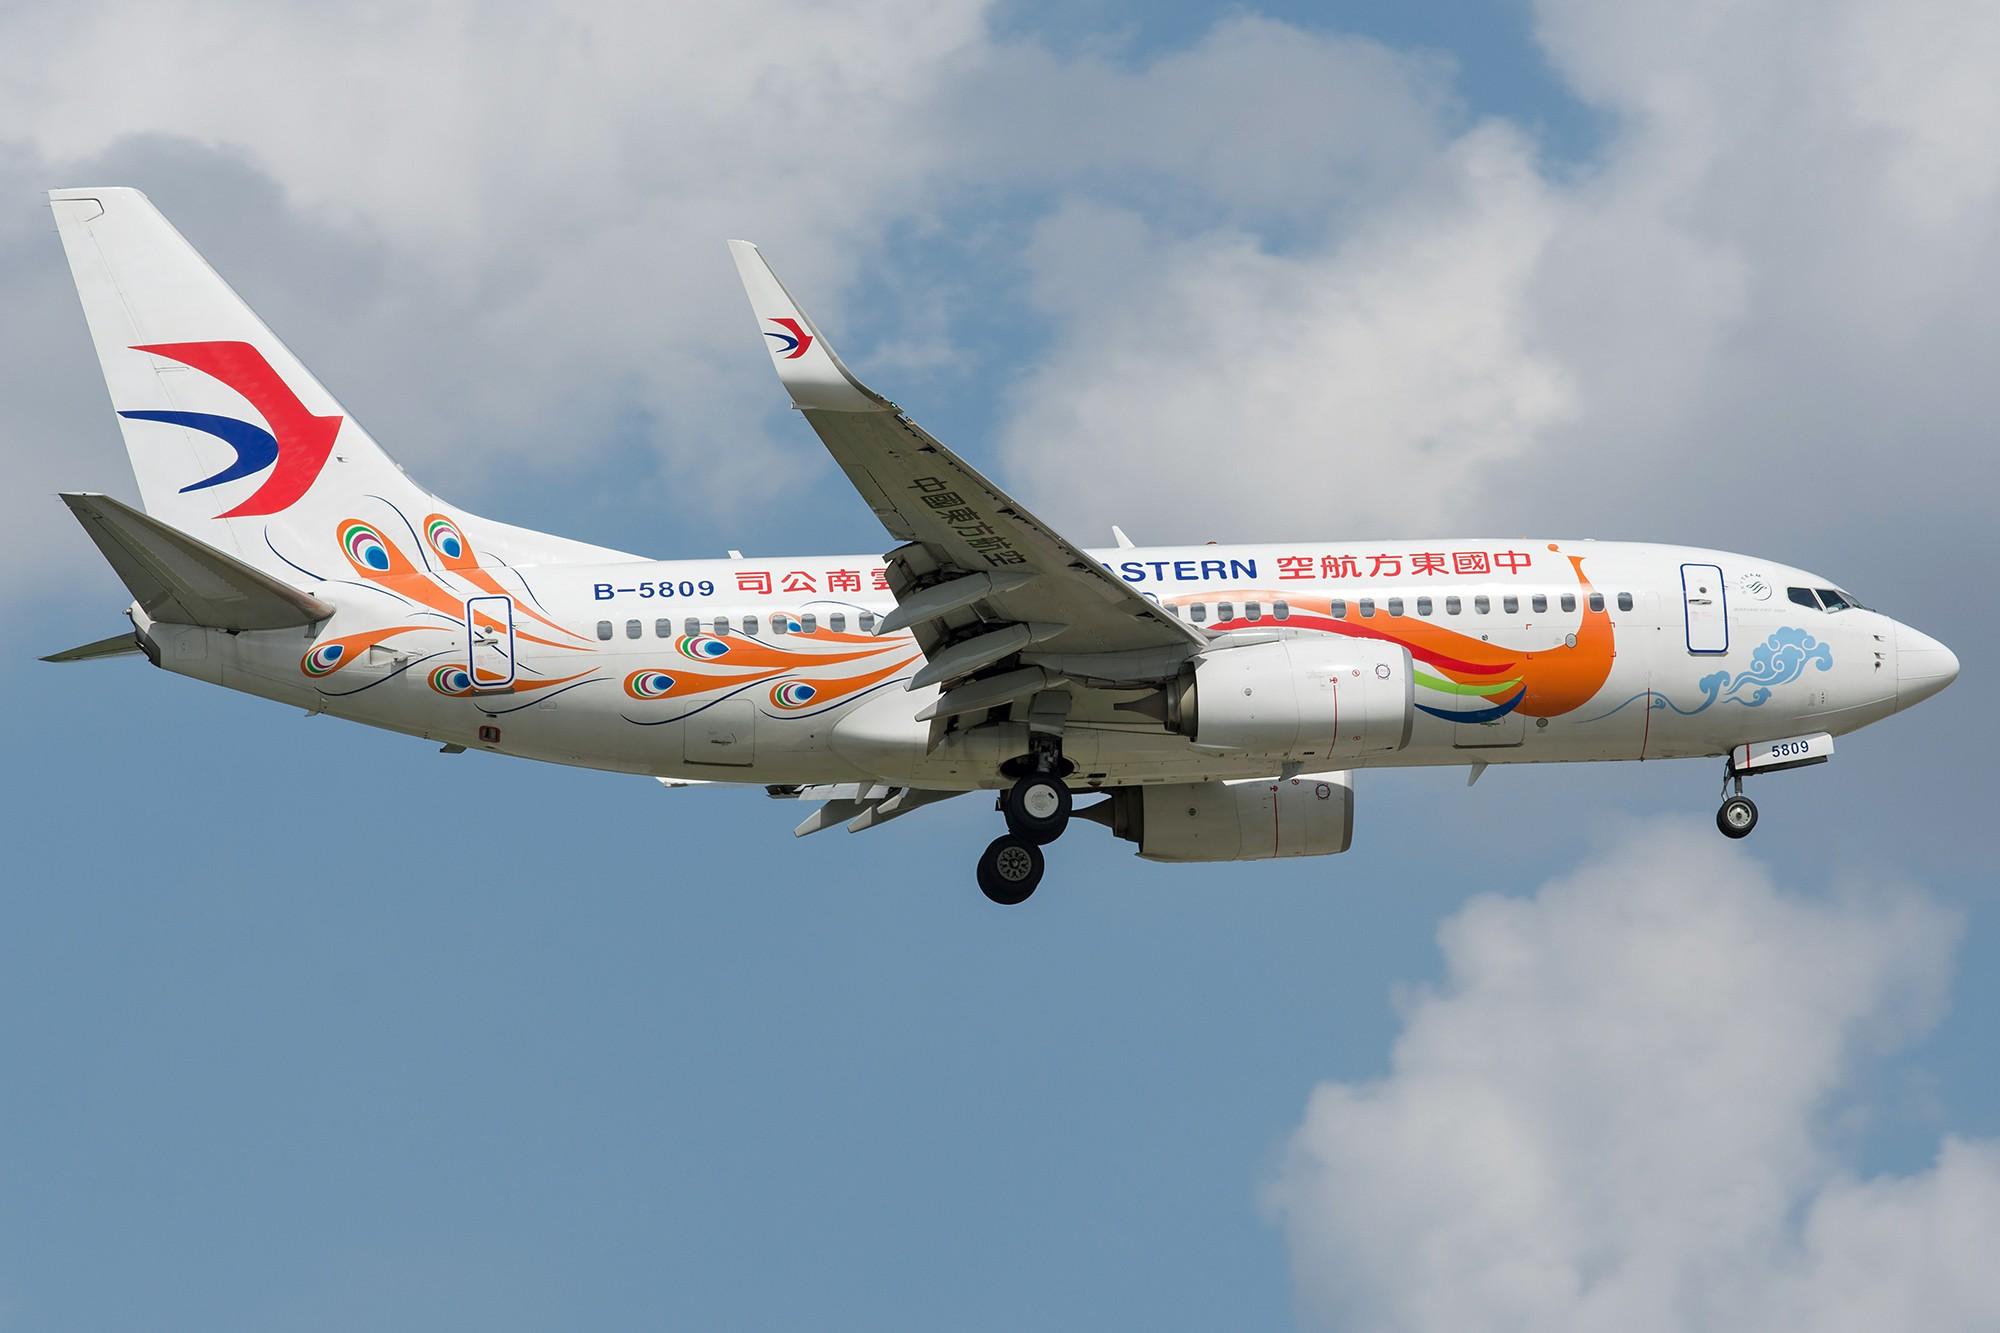 Re:[原创][SHA]蓝天白云下737一组 BOEING 737-700 B-5809 中国上海虹桥国际机场